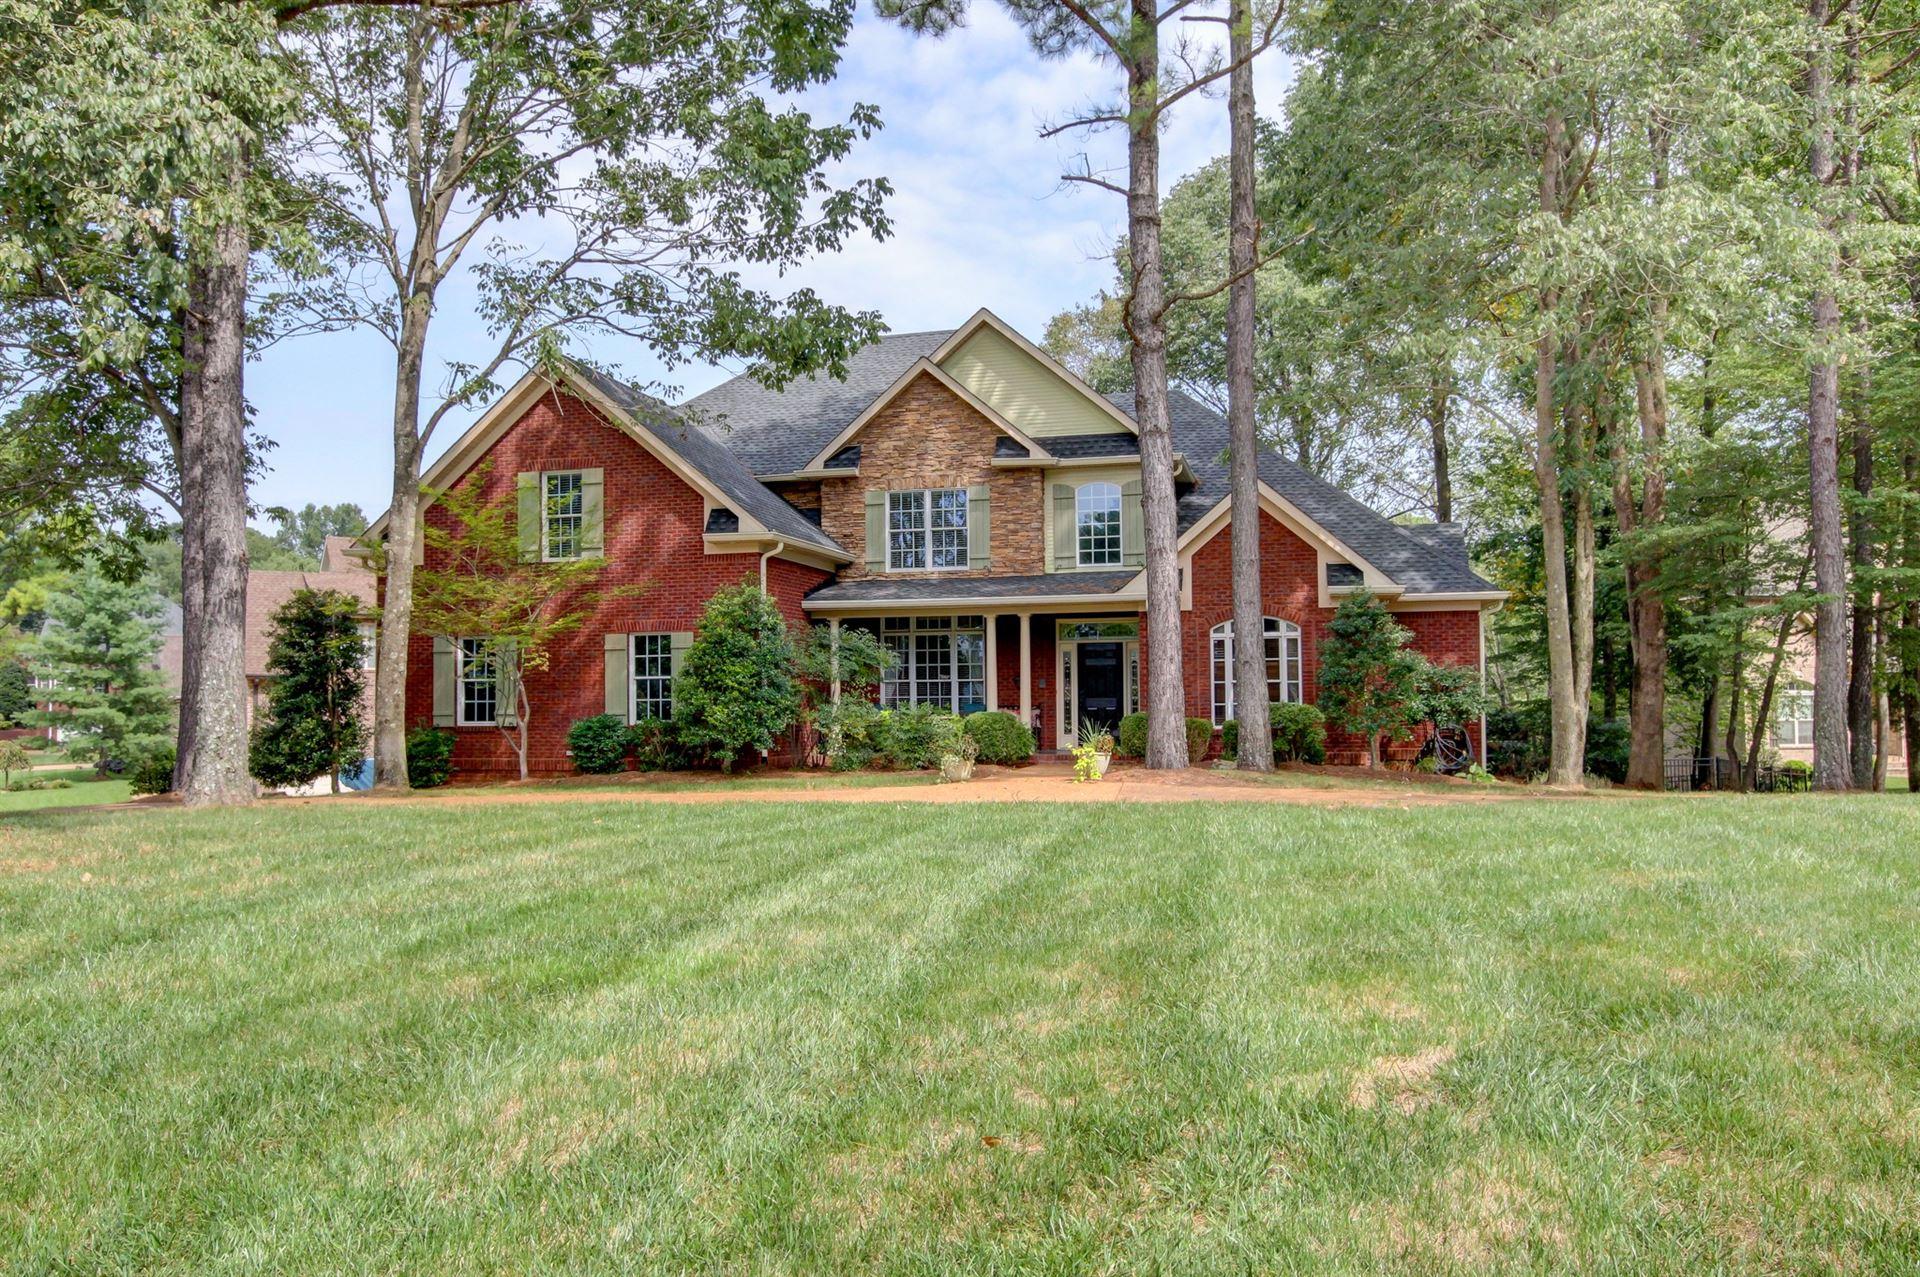 833 Salisbury Way, Clarksville, TN 37043 - MLS#: 2184340